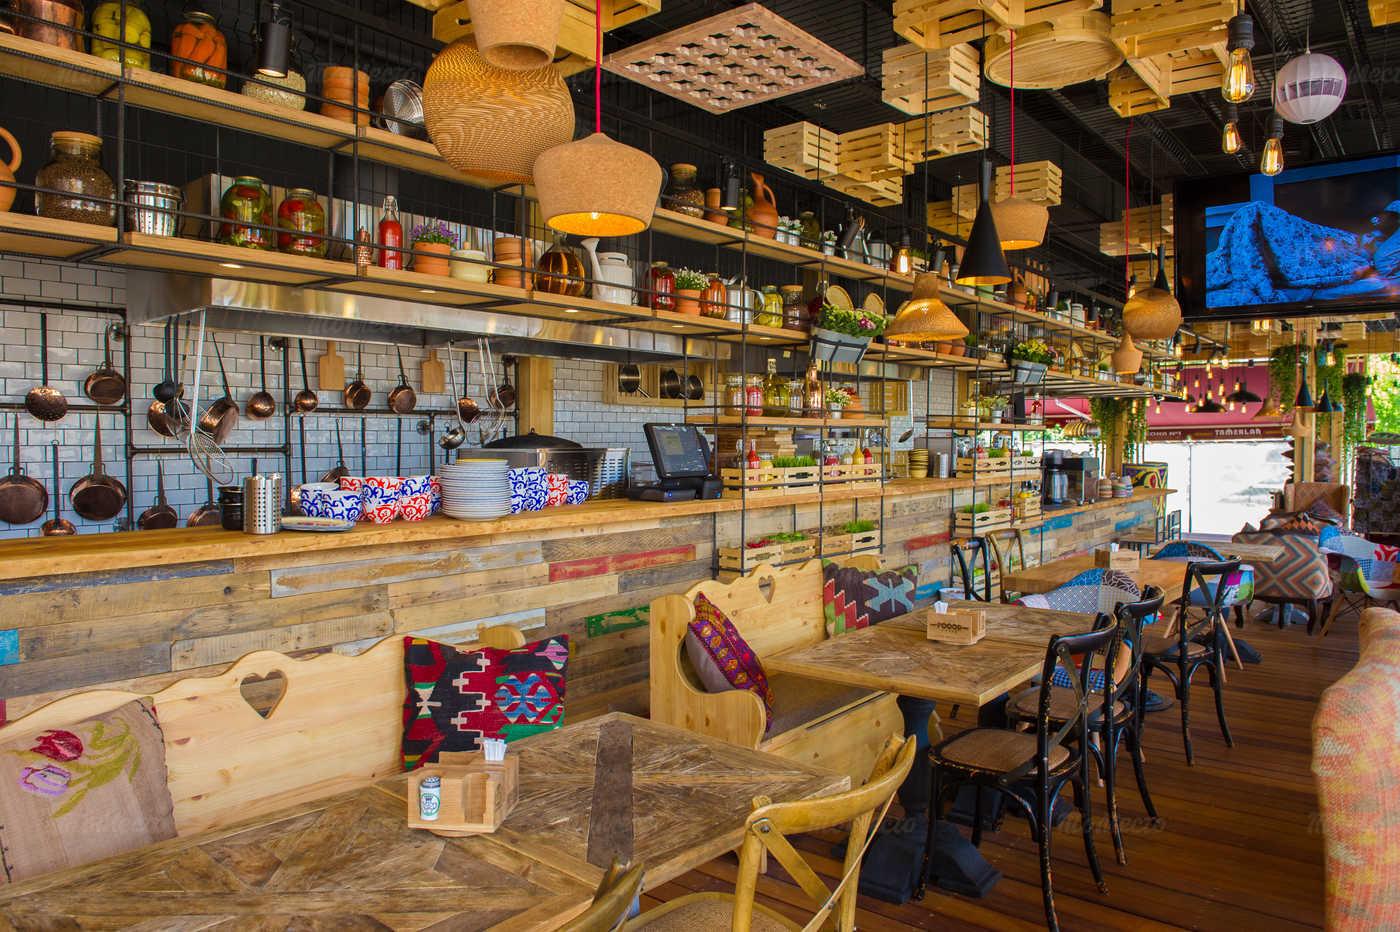 Банкеты ресторана FOOD BAZAR (Фуд базар) на улице Каретный Ряд фото 7